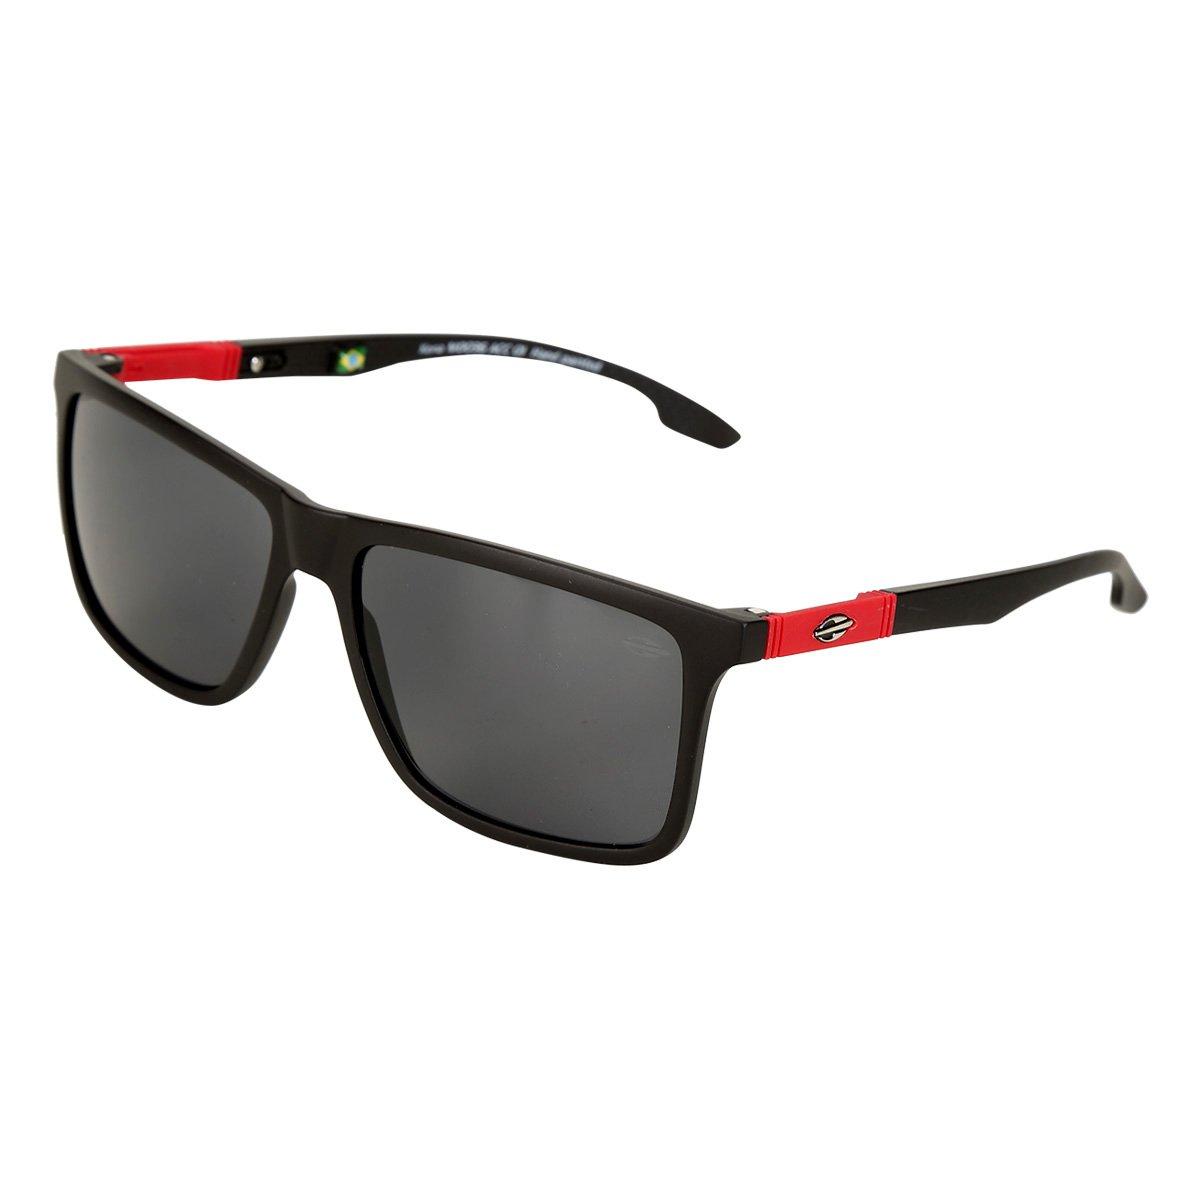 8c84f8815 Óculos de Sol Mormaii Kona Masculino